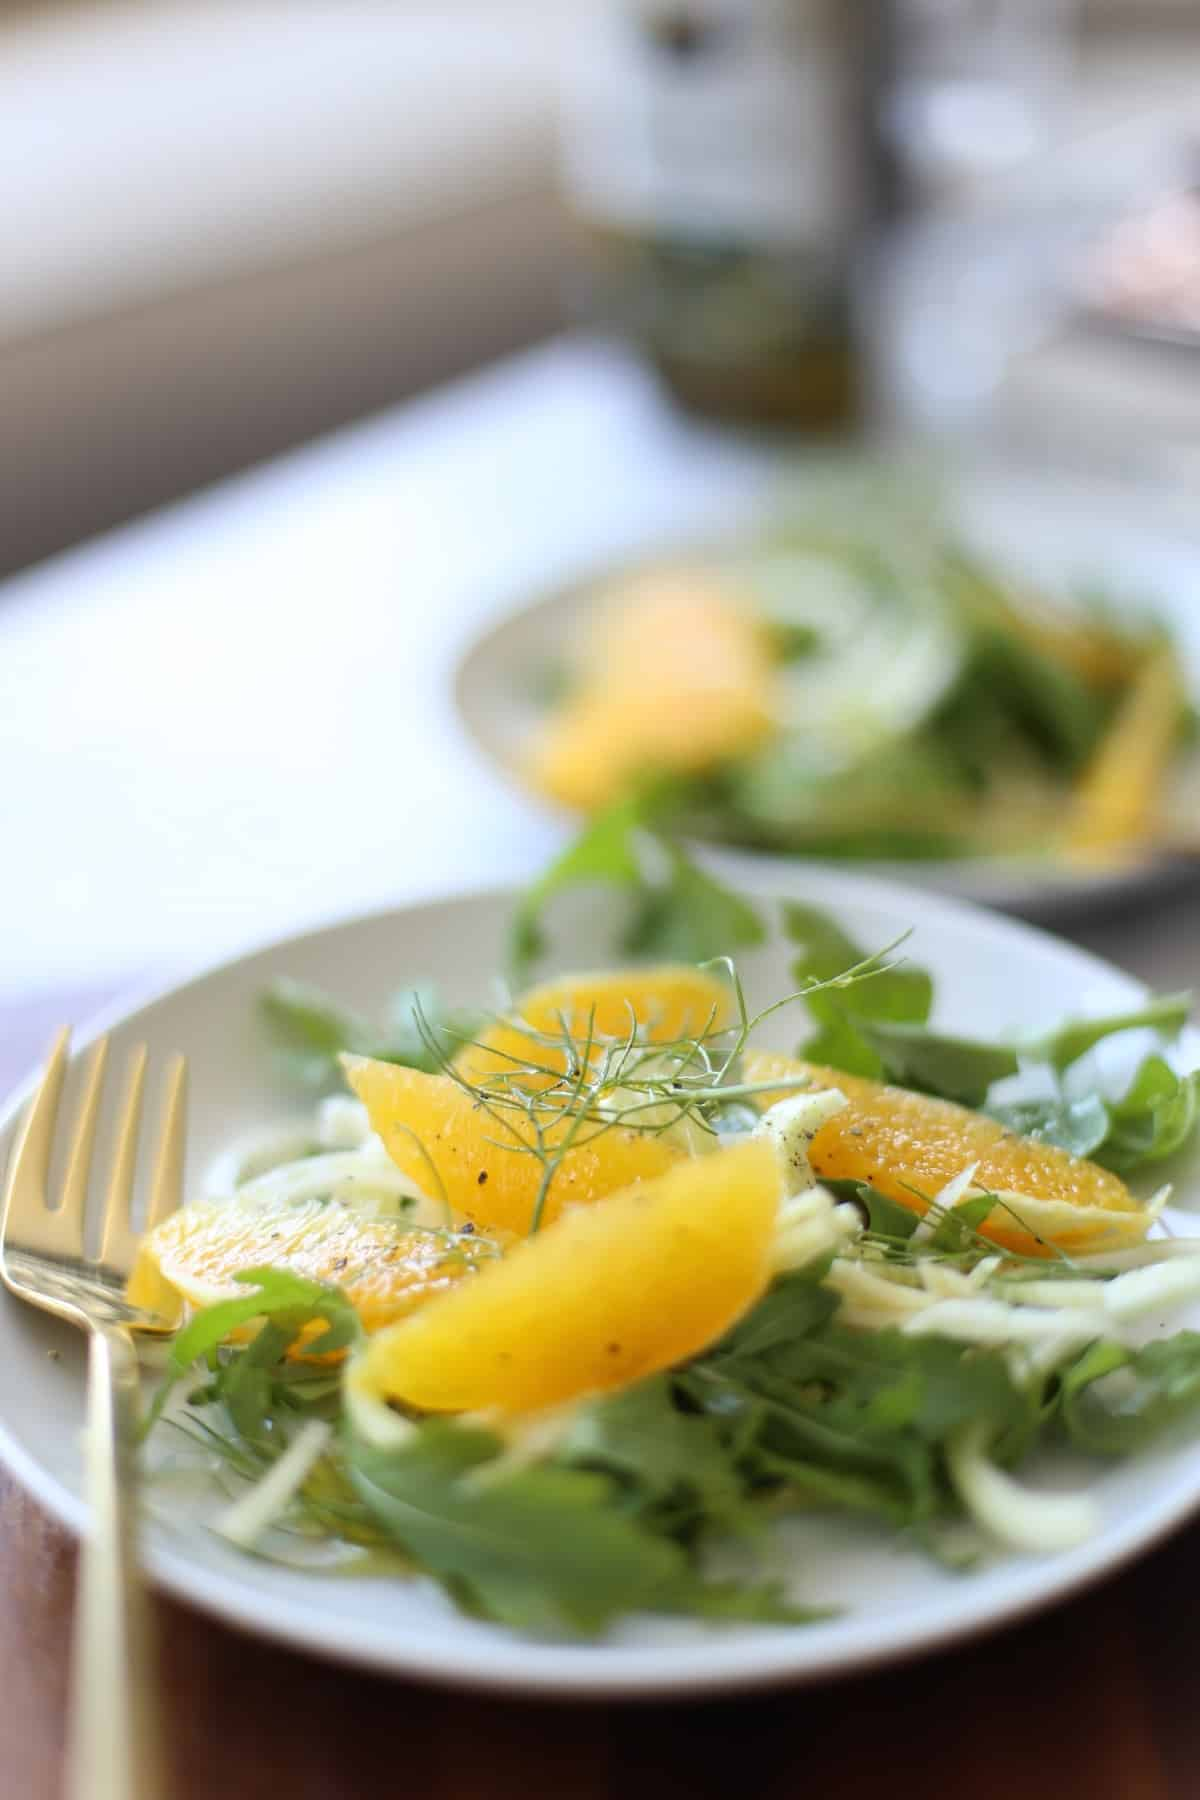 Fennel and orange salad recipe for summer